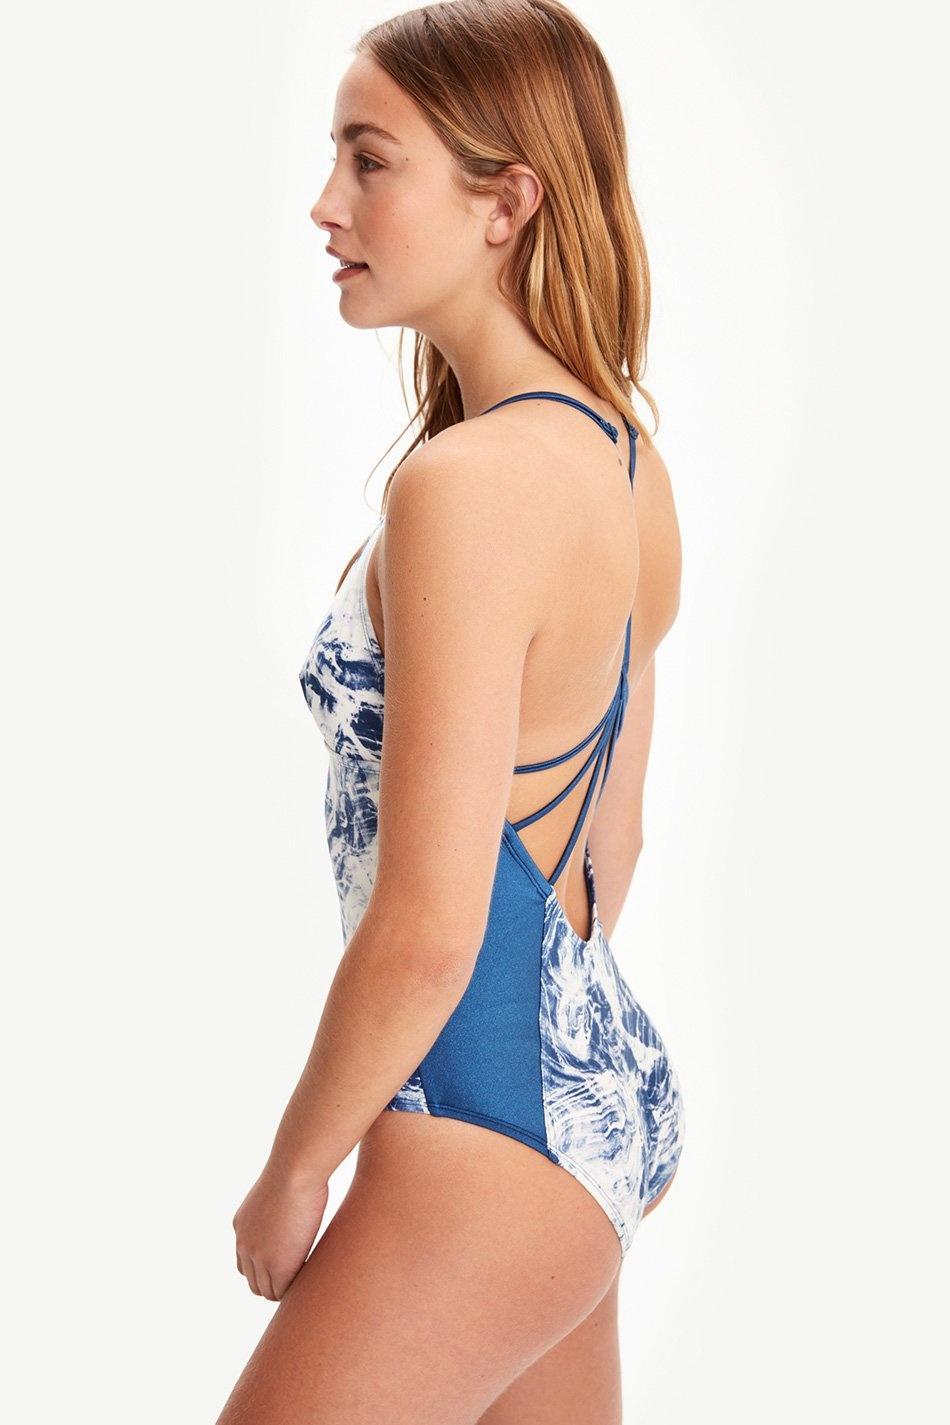 Lole Madeirella One Piece Swimsuit